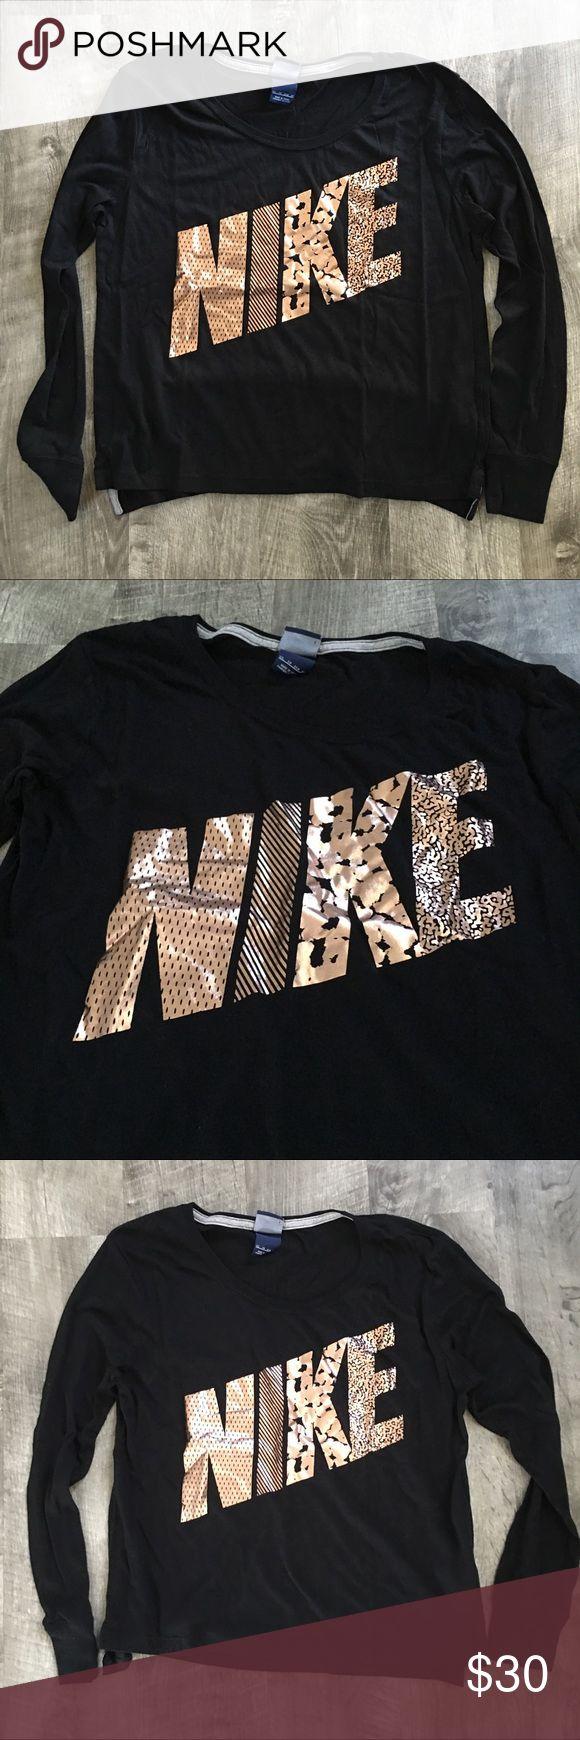 Nike rose gold slouchy long sleeve XS Very lightly worn. Like new. Nike Tops Tees - Long Sleeve